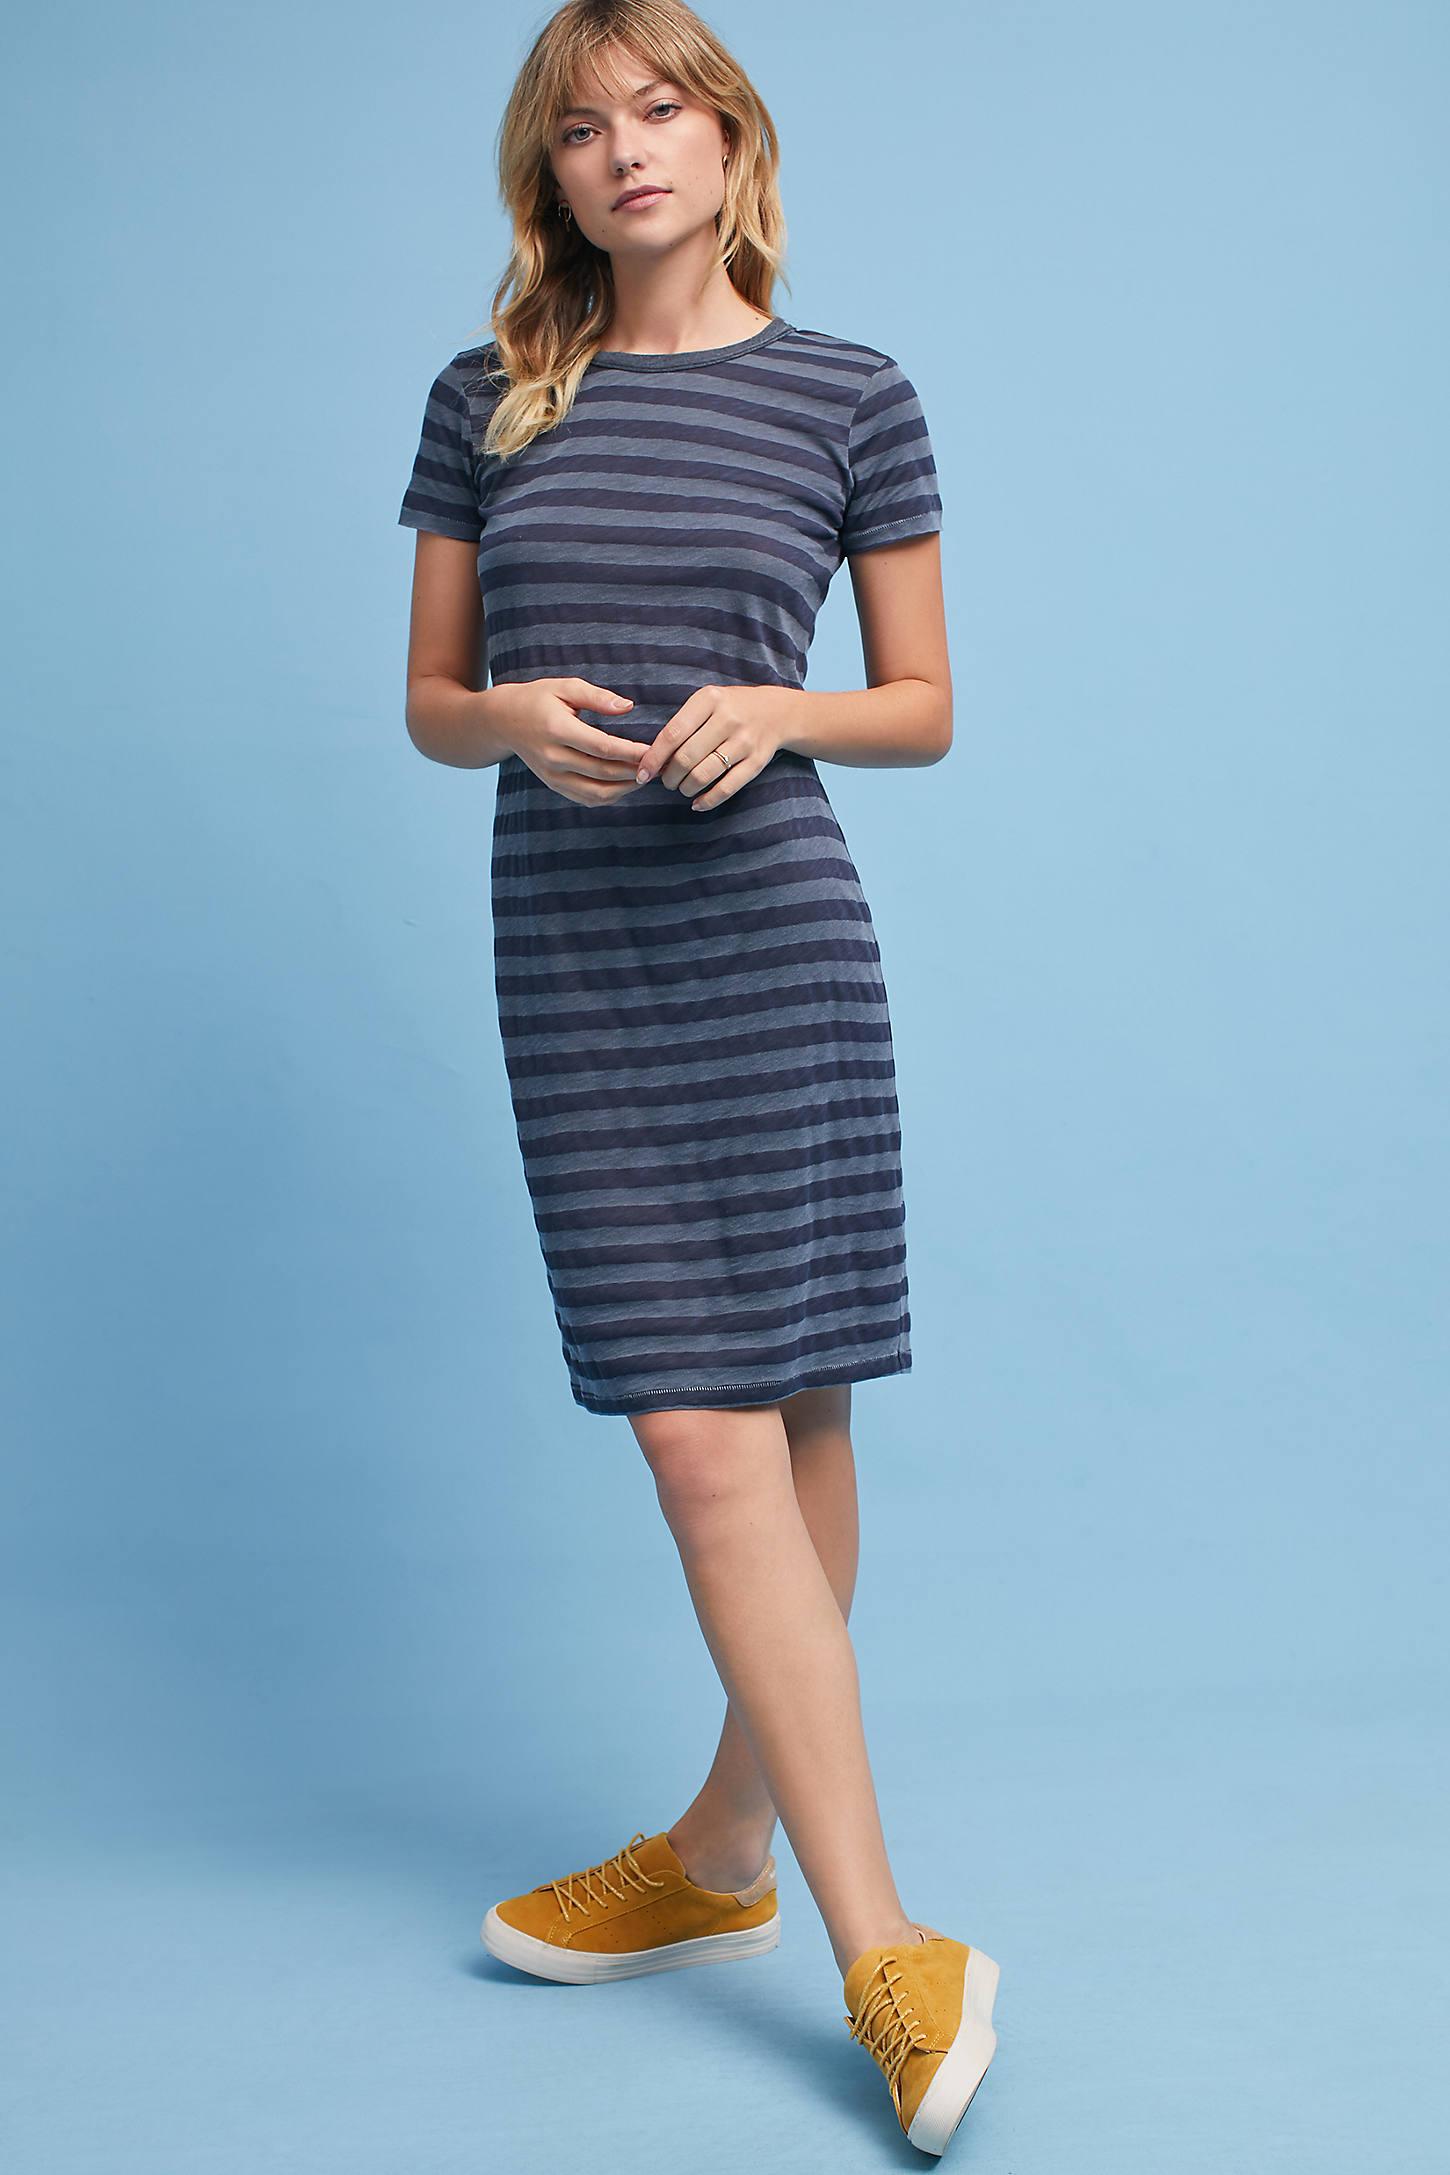 Stateside Striped Dress